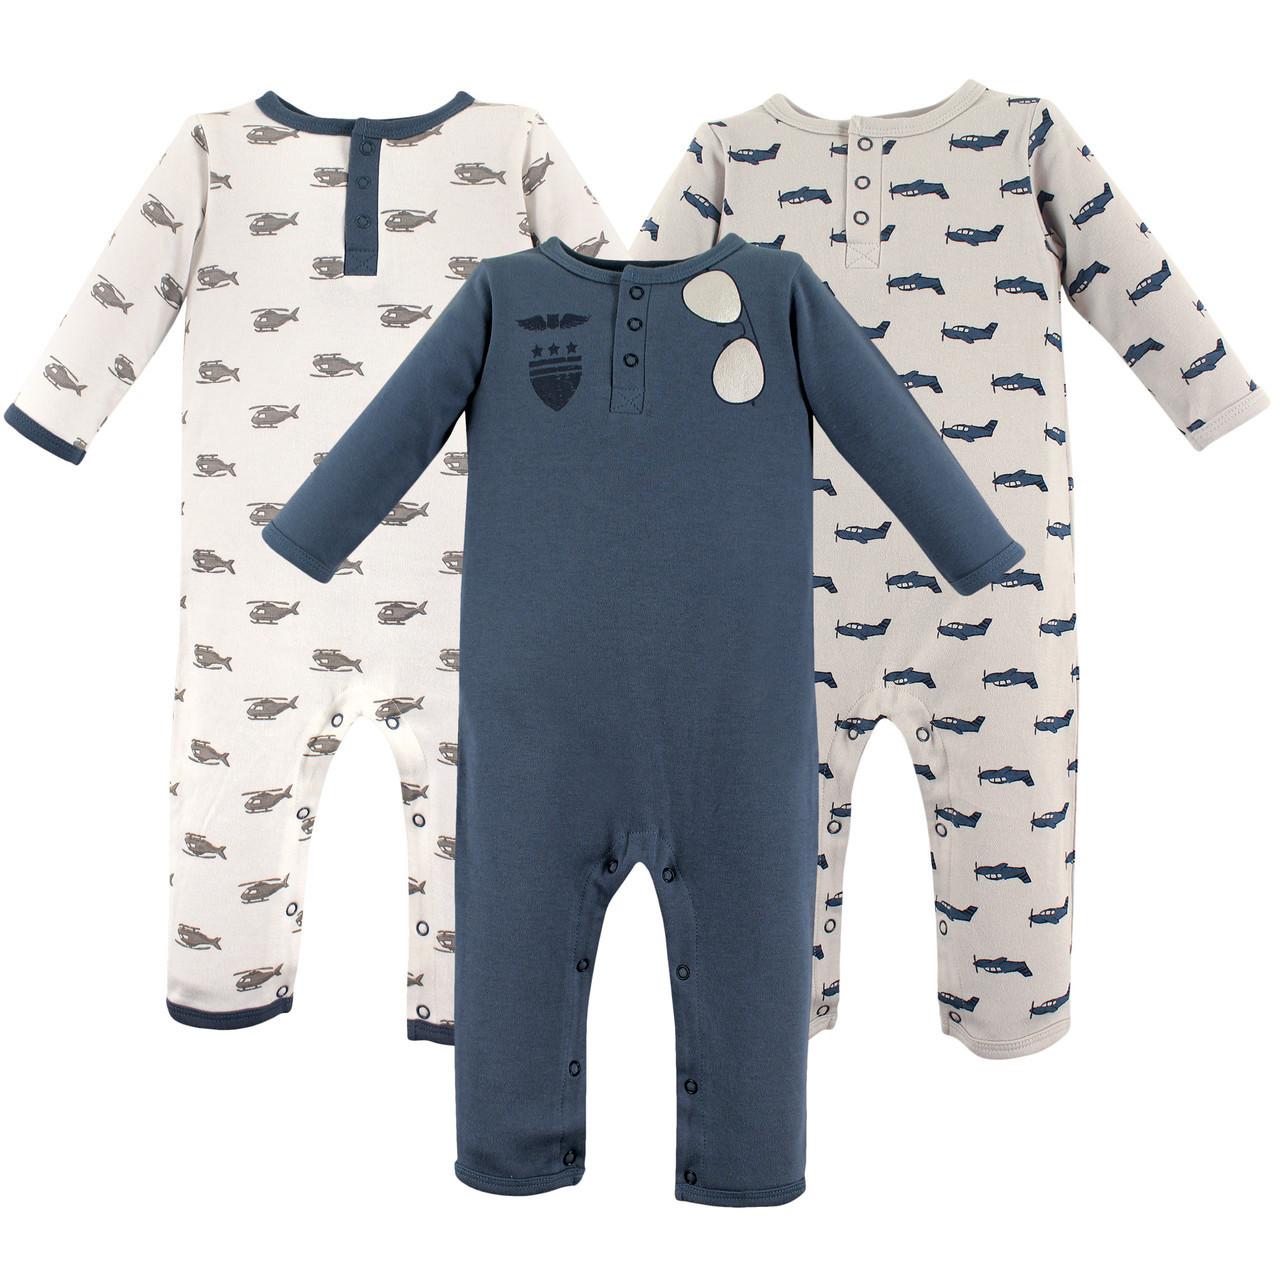 Aviator 3-Pack Hudson Baby Boy Sleep Gowns